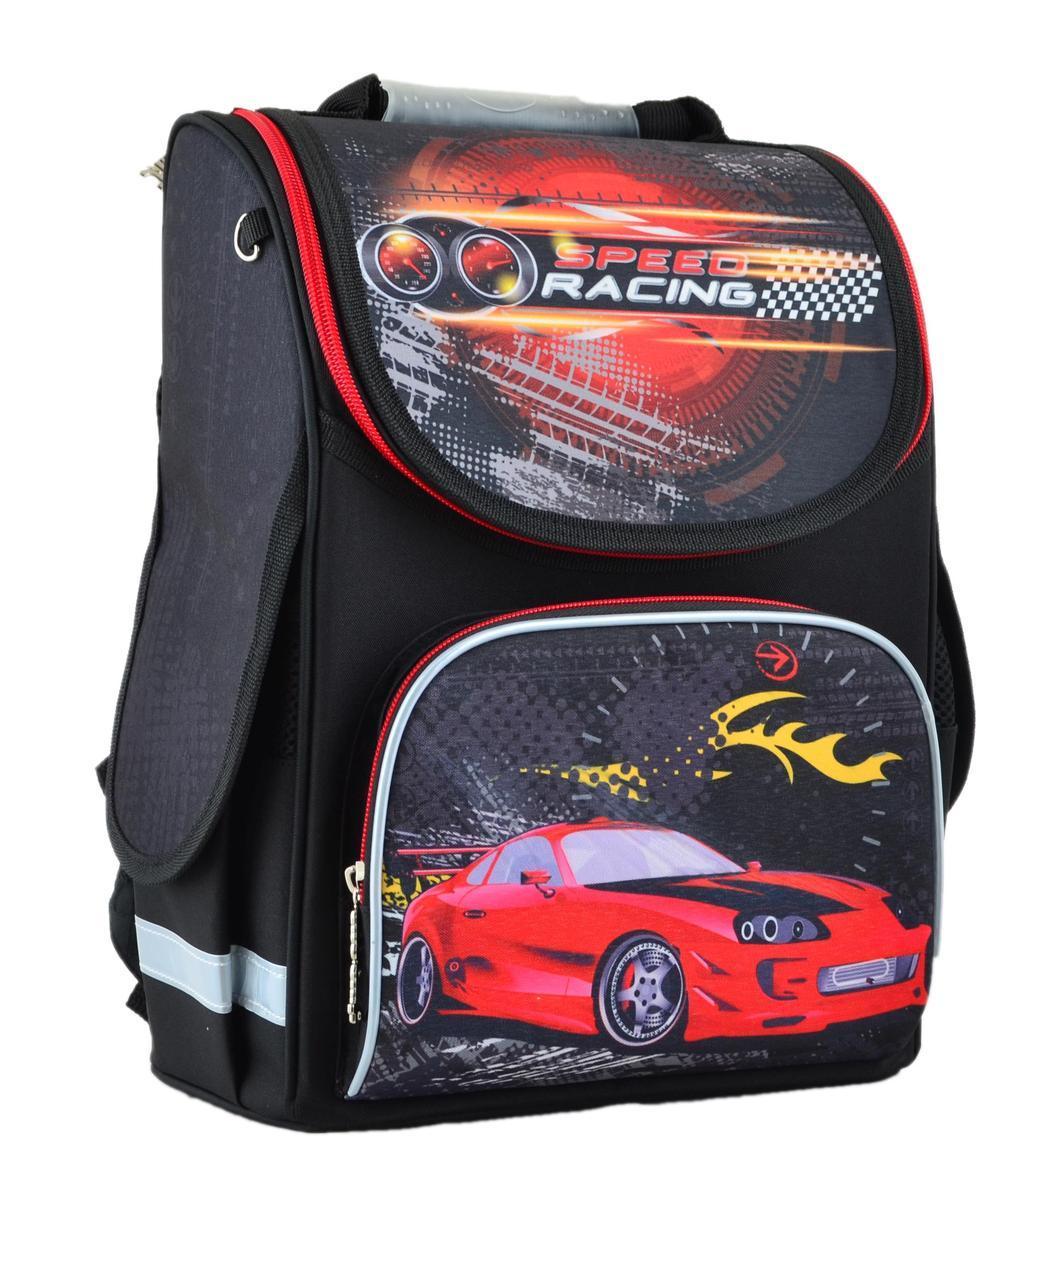 Рюкзак каркасный  PG-11 Speed racing  554547  Smart